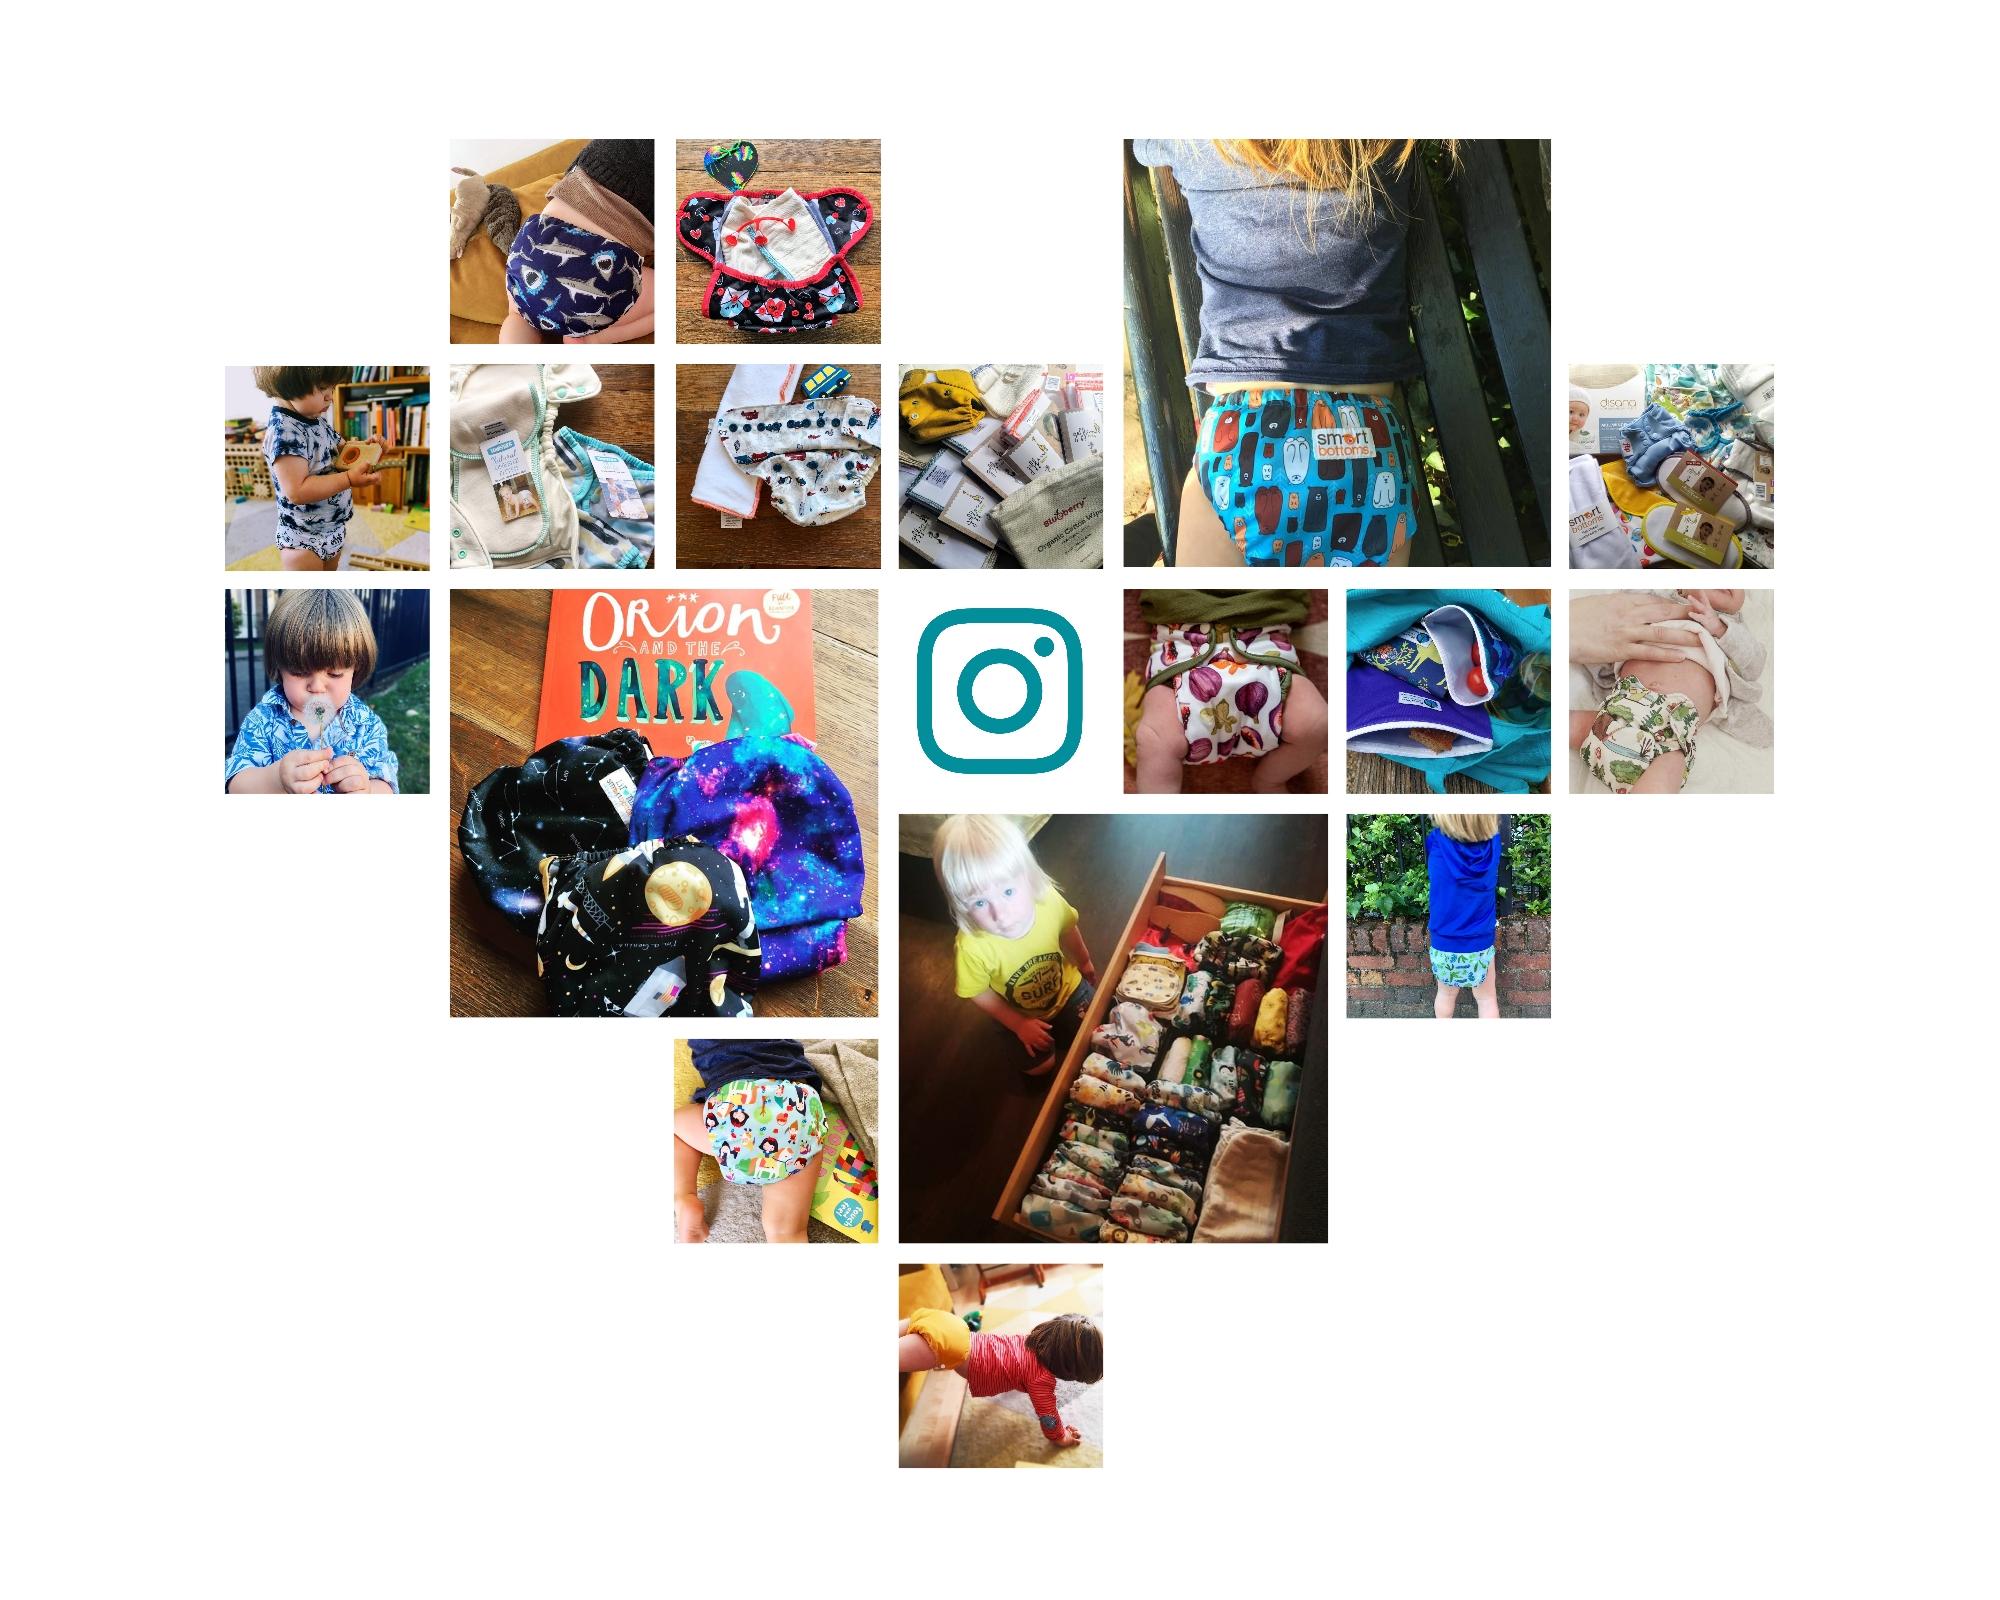 Instagram Plenkoteka